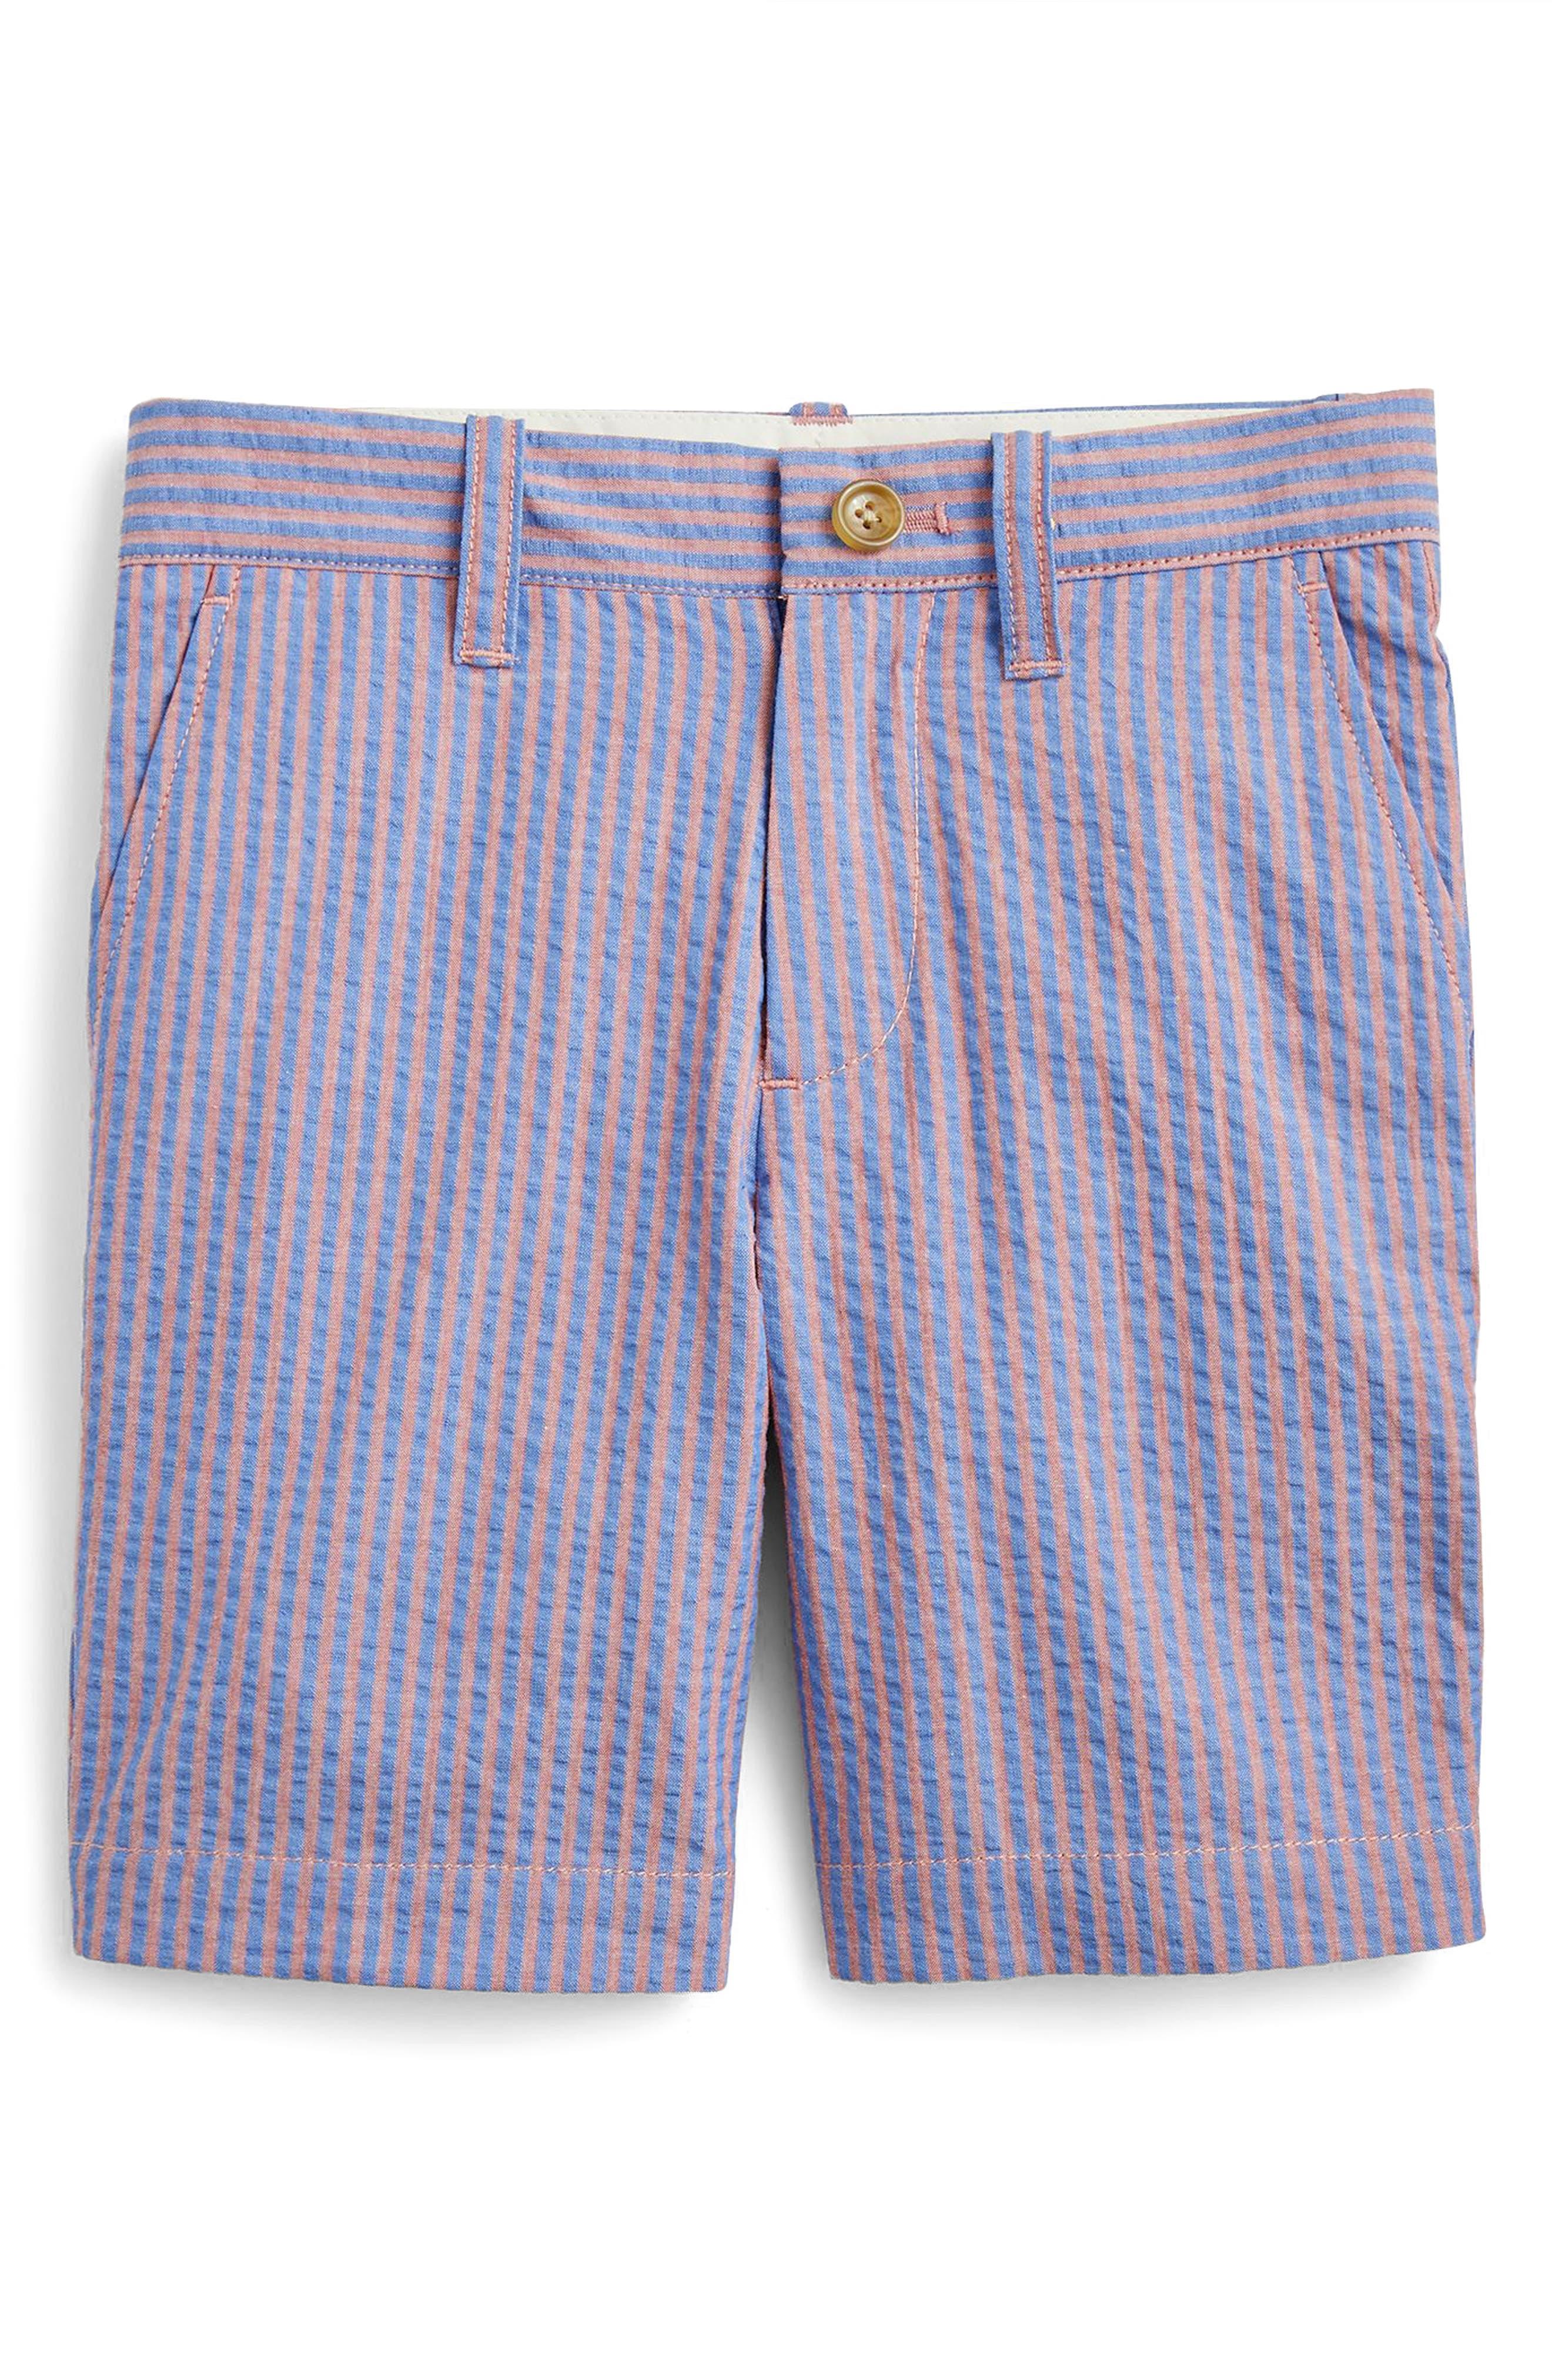 Stanton Seersucker Shorts,                             Main thumbnail 1, color,                             600